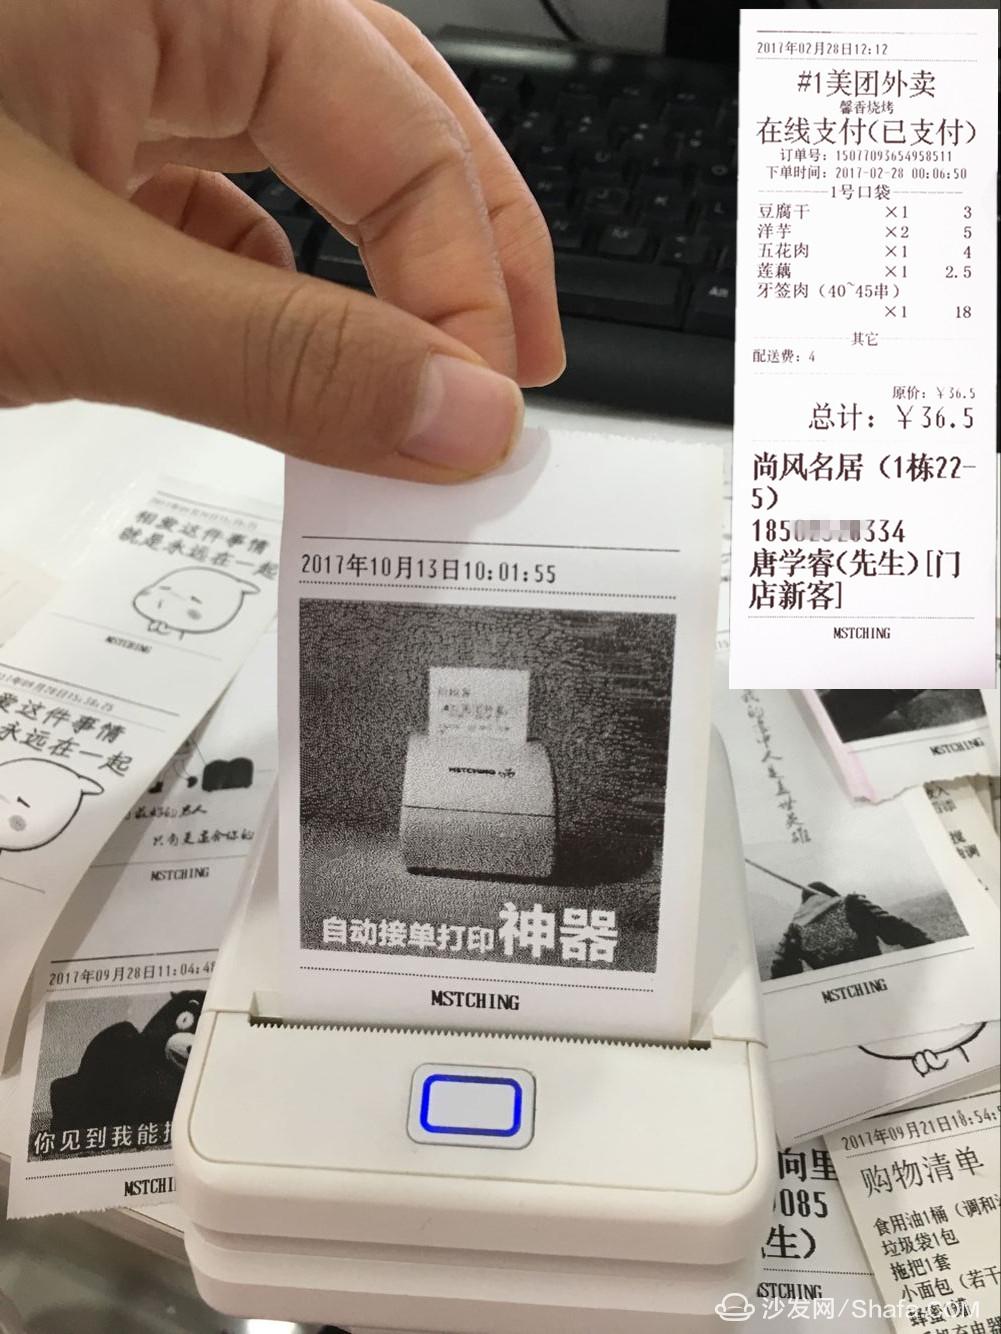 QQ图片20171013103720_副本.jpg